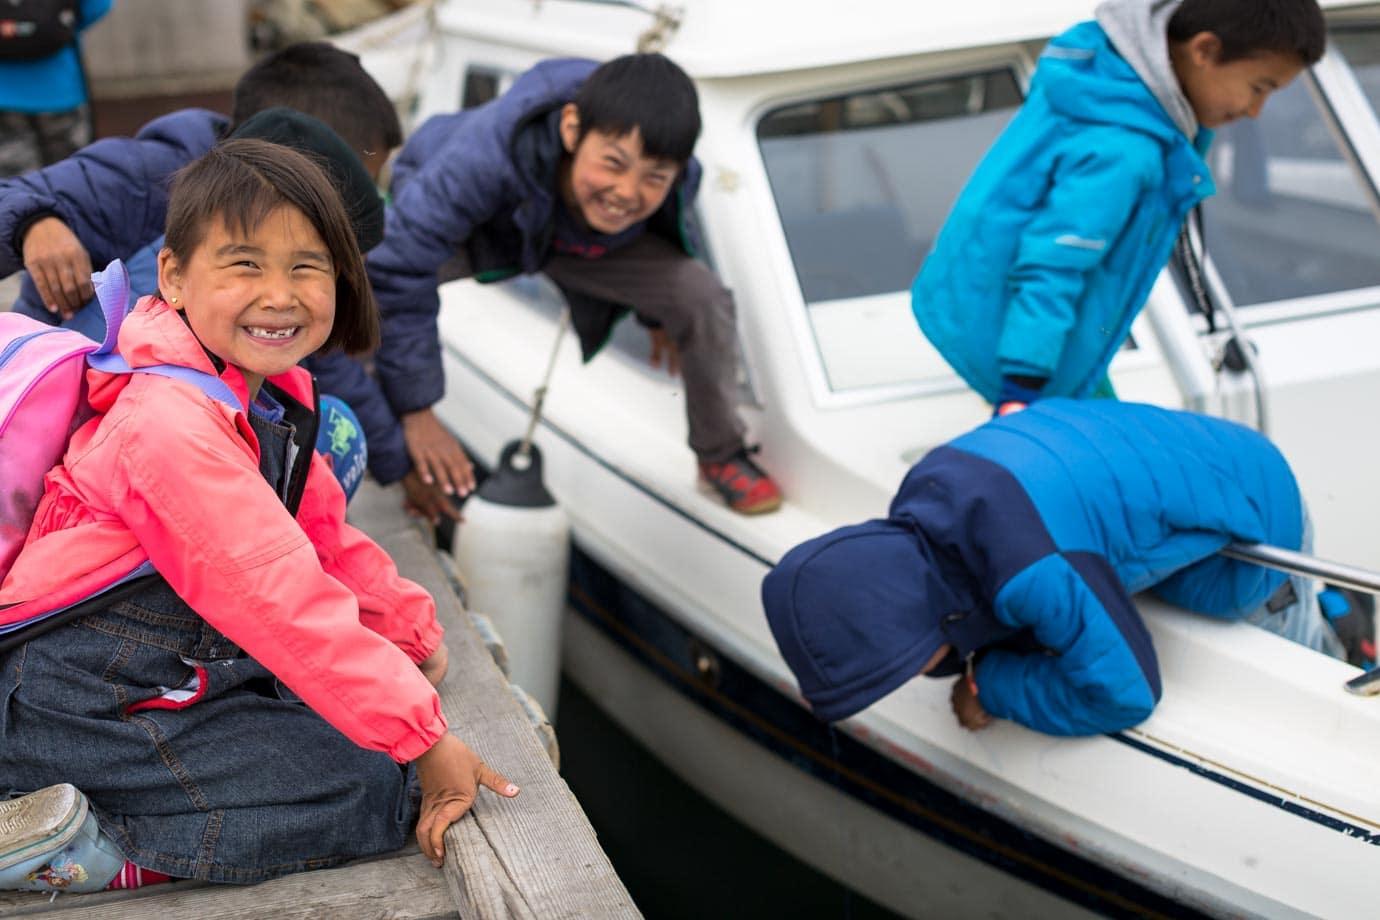 Kids in Greenland